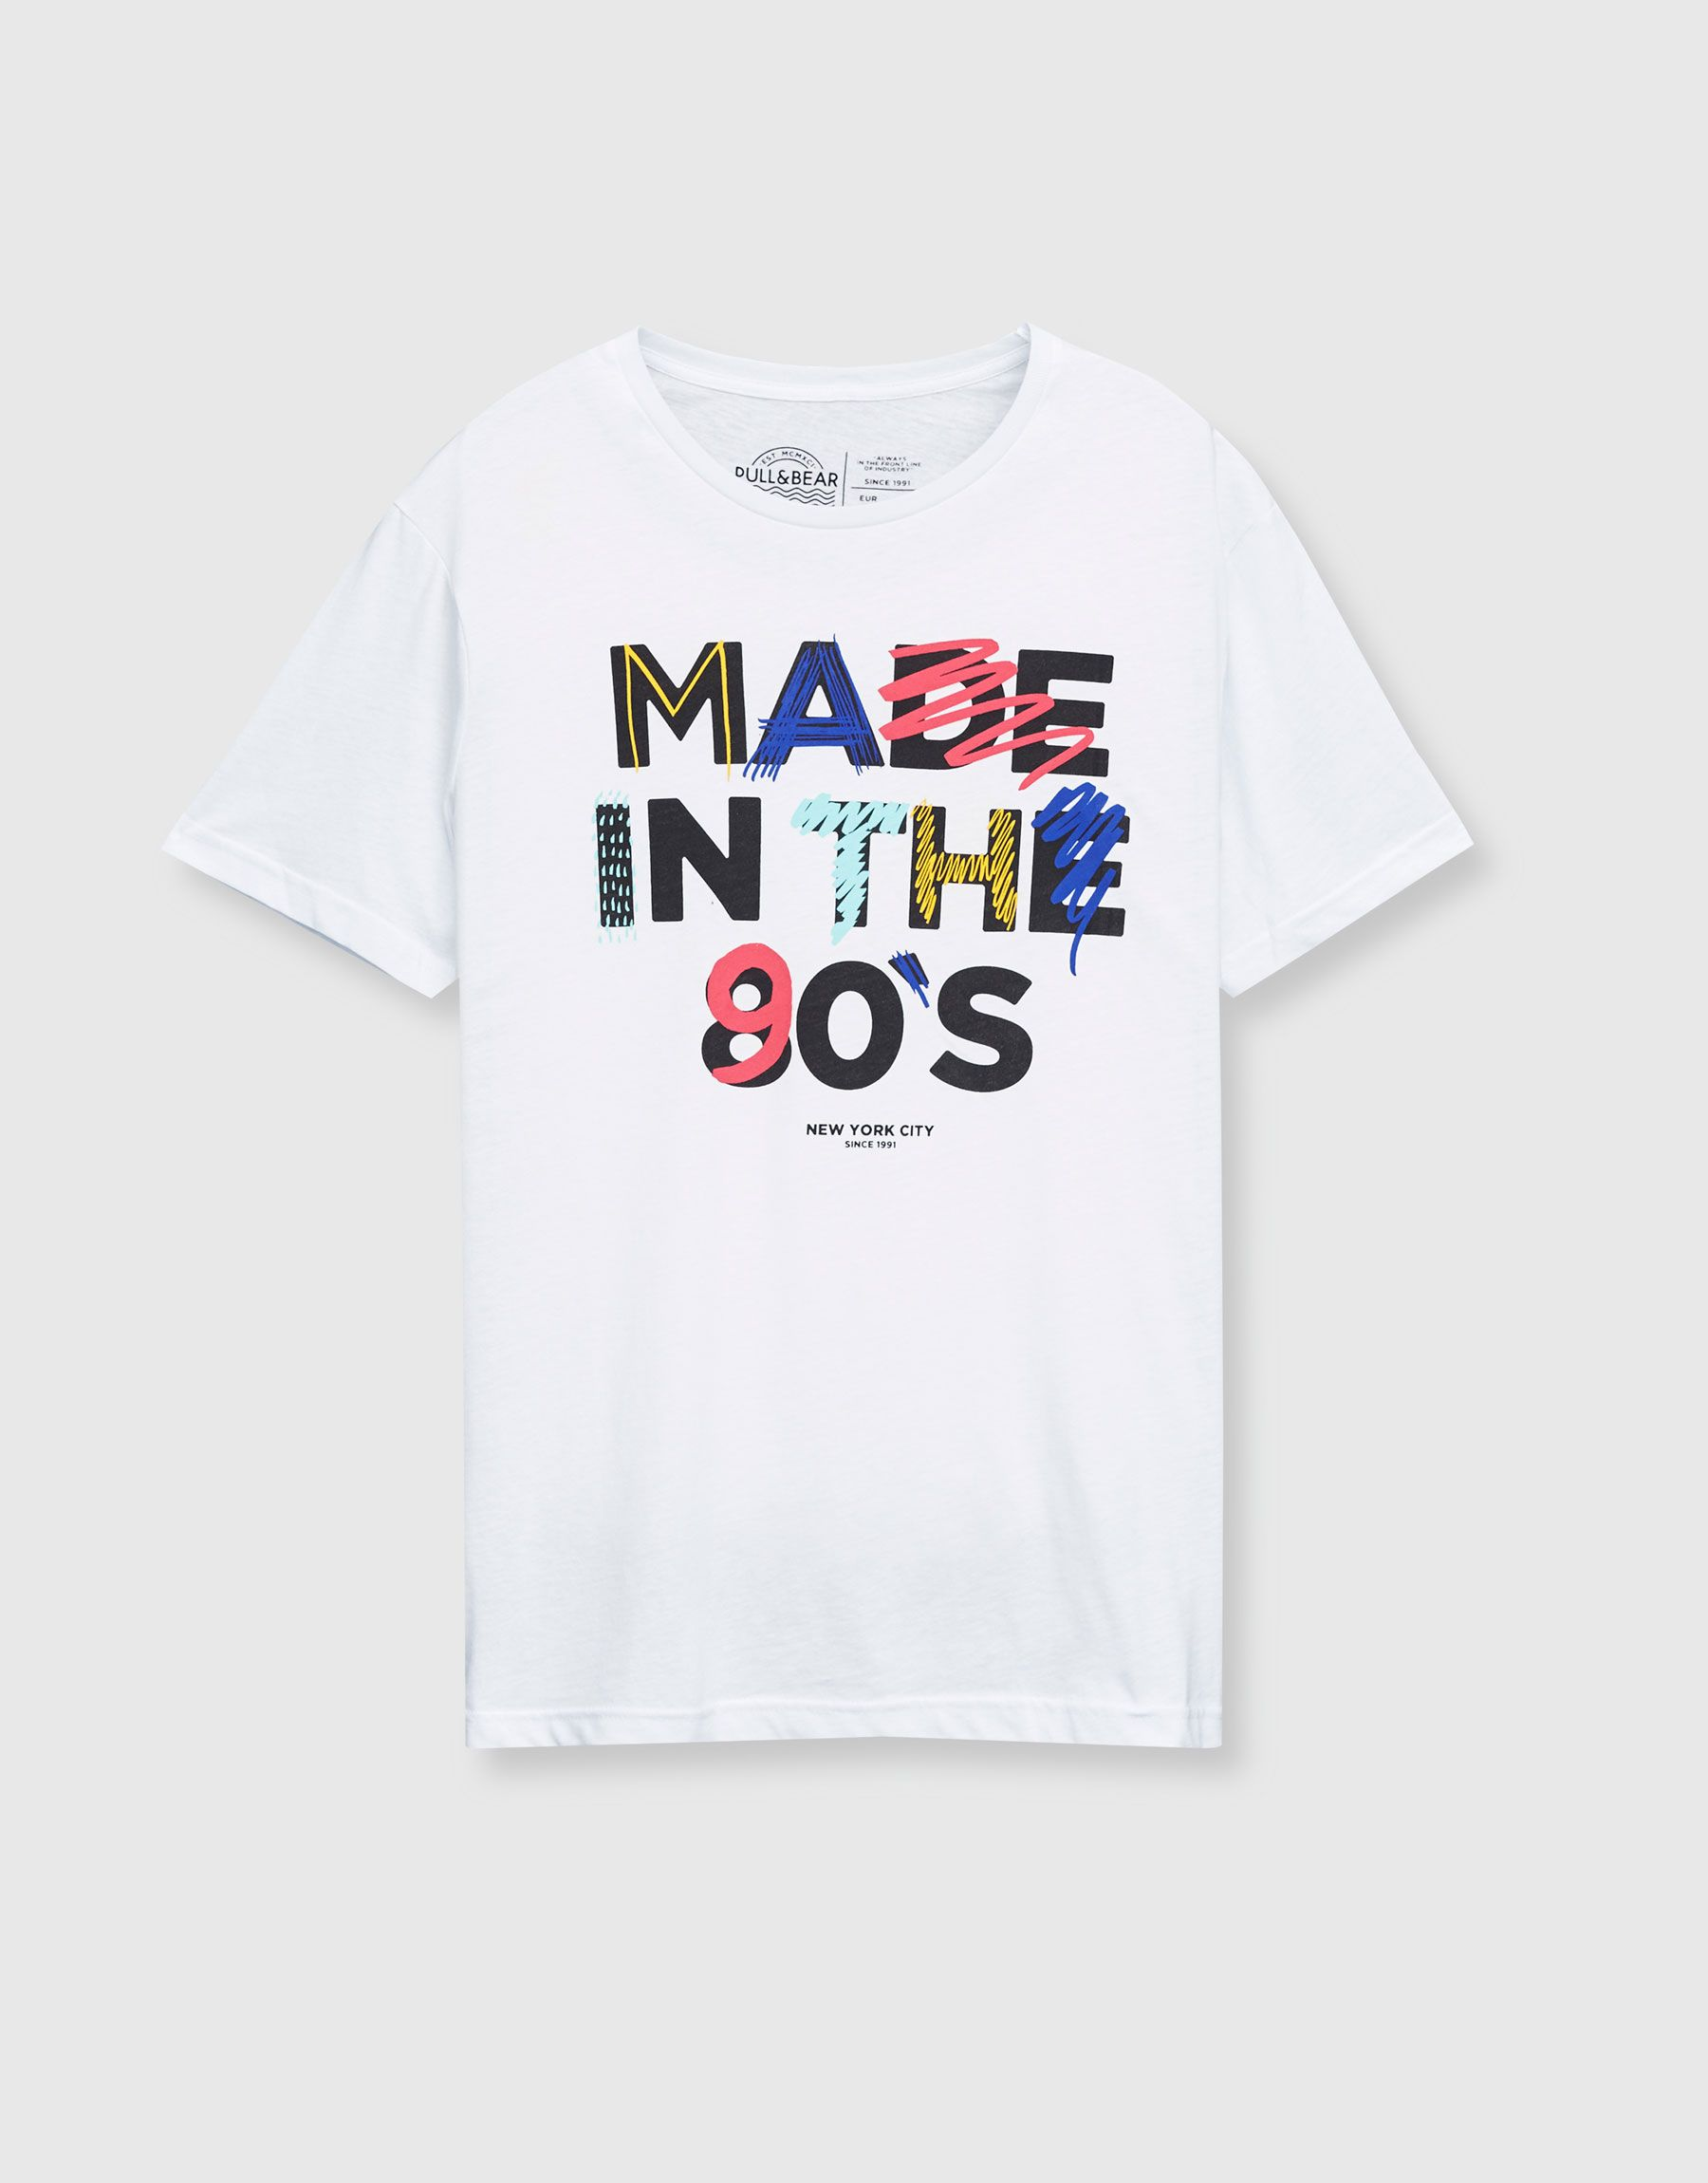 7ab1c002447cb Camiseta print texto 90s - Camisetas - Ropa - Hombre - PULL BEAR España